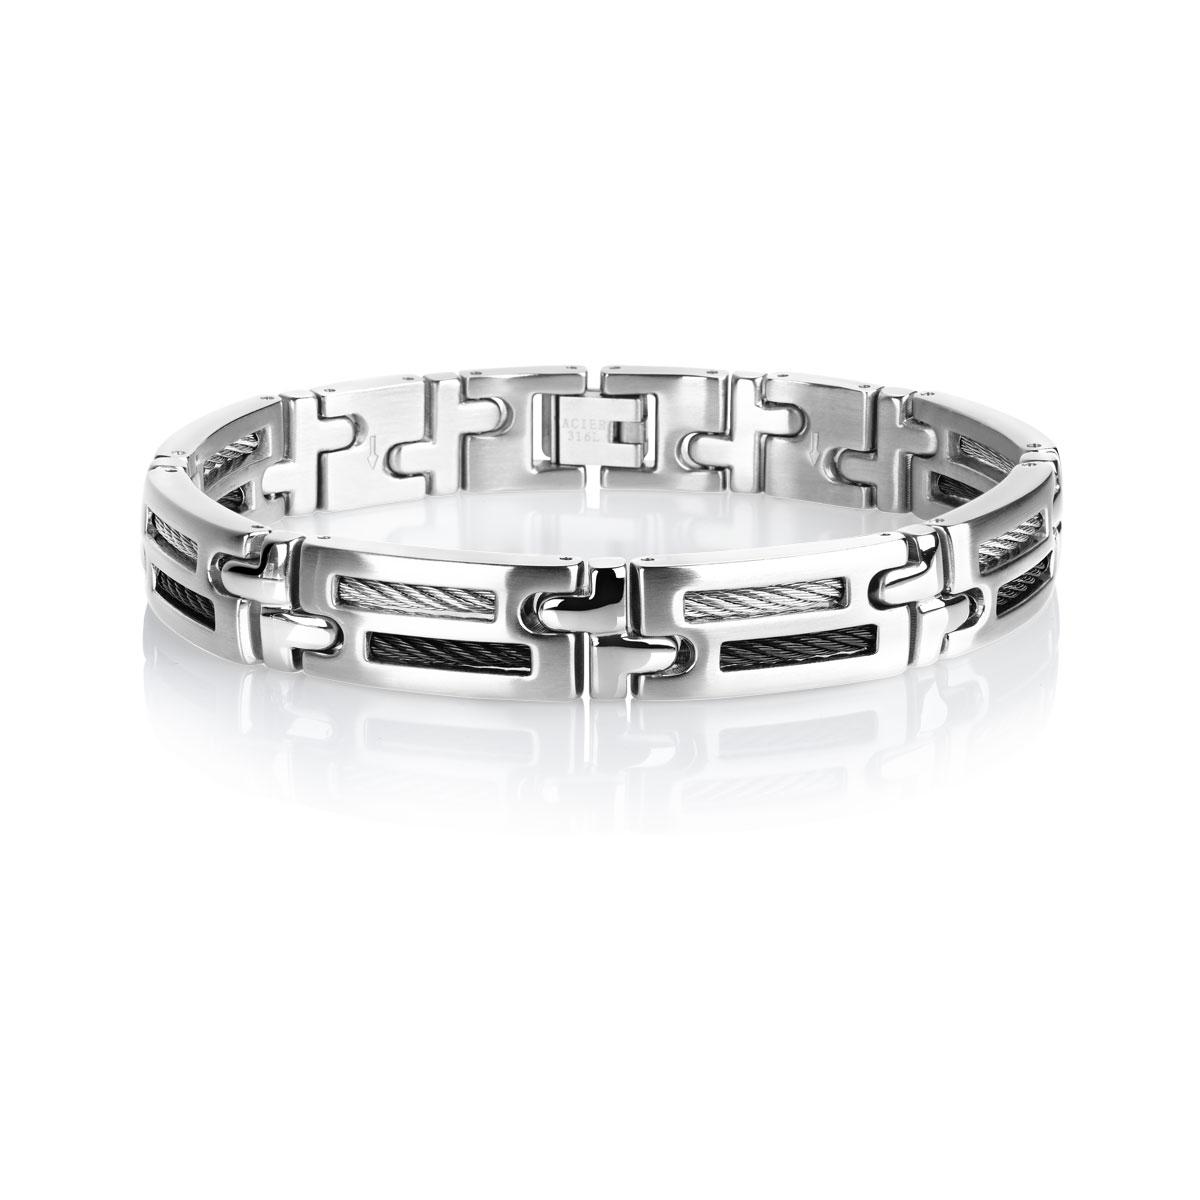 bracelet acier cable homme bracelet souple maty. Black Bedroom Furniture Sets. Home Design Ideas